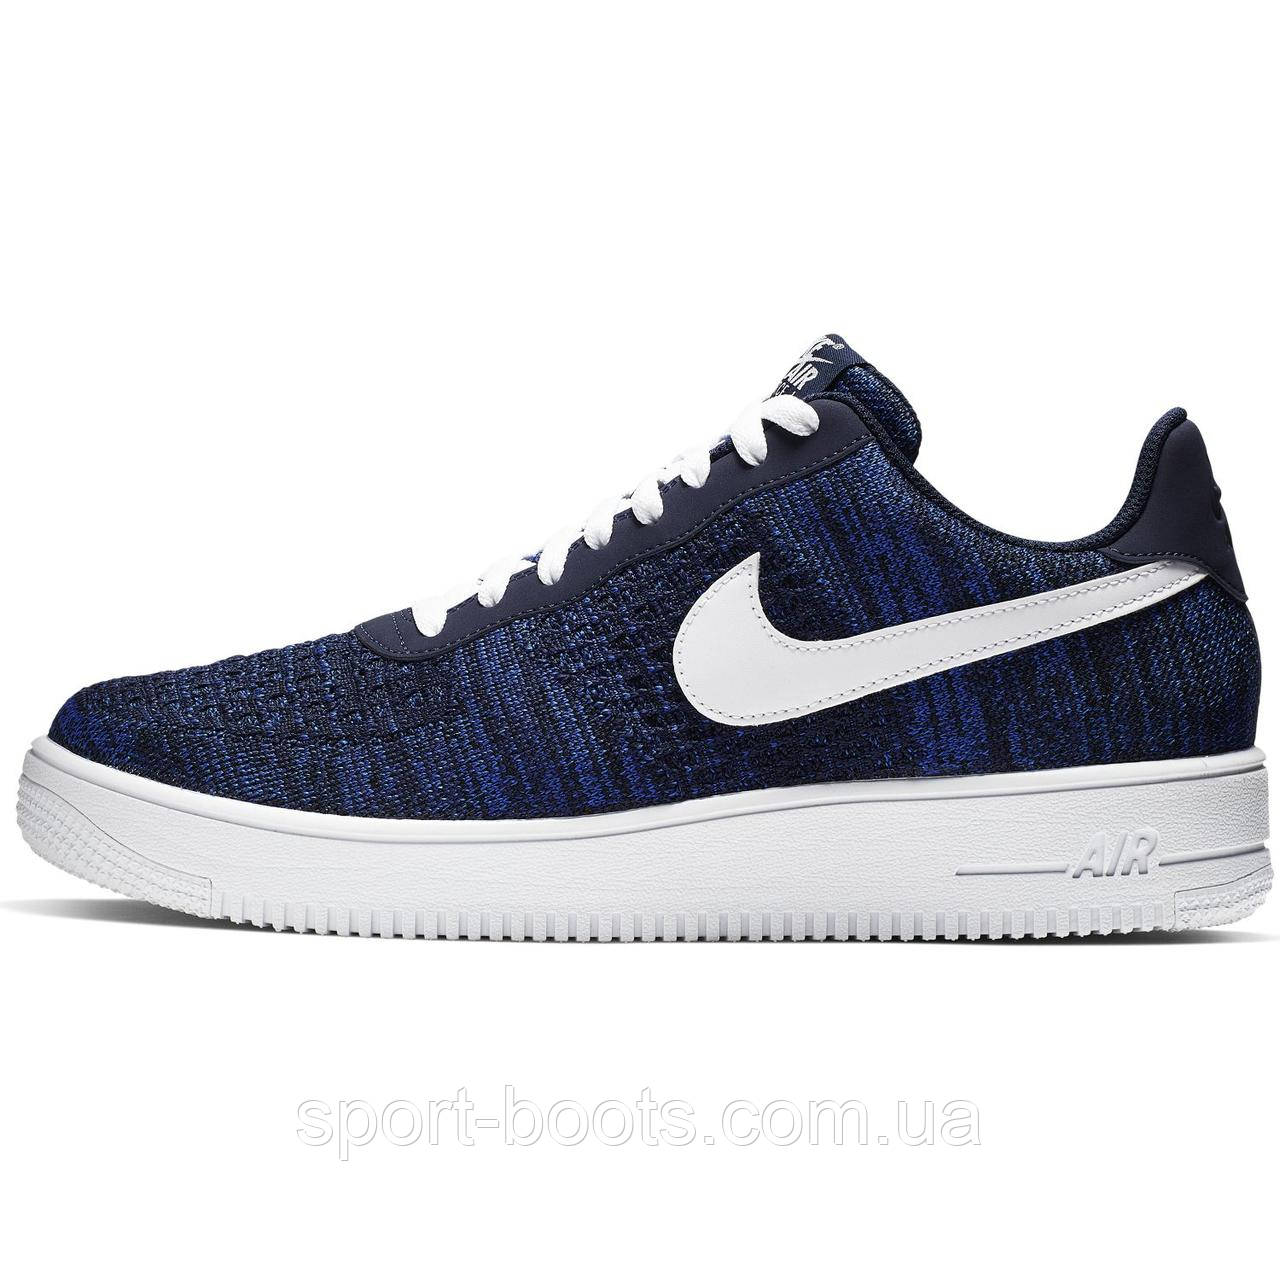 5853779e Оригинальные мужские кроссовки Nike AIR FORCE 1 FLYKNIT 2.0: продажа ...